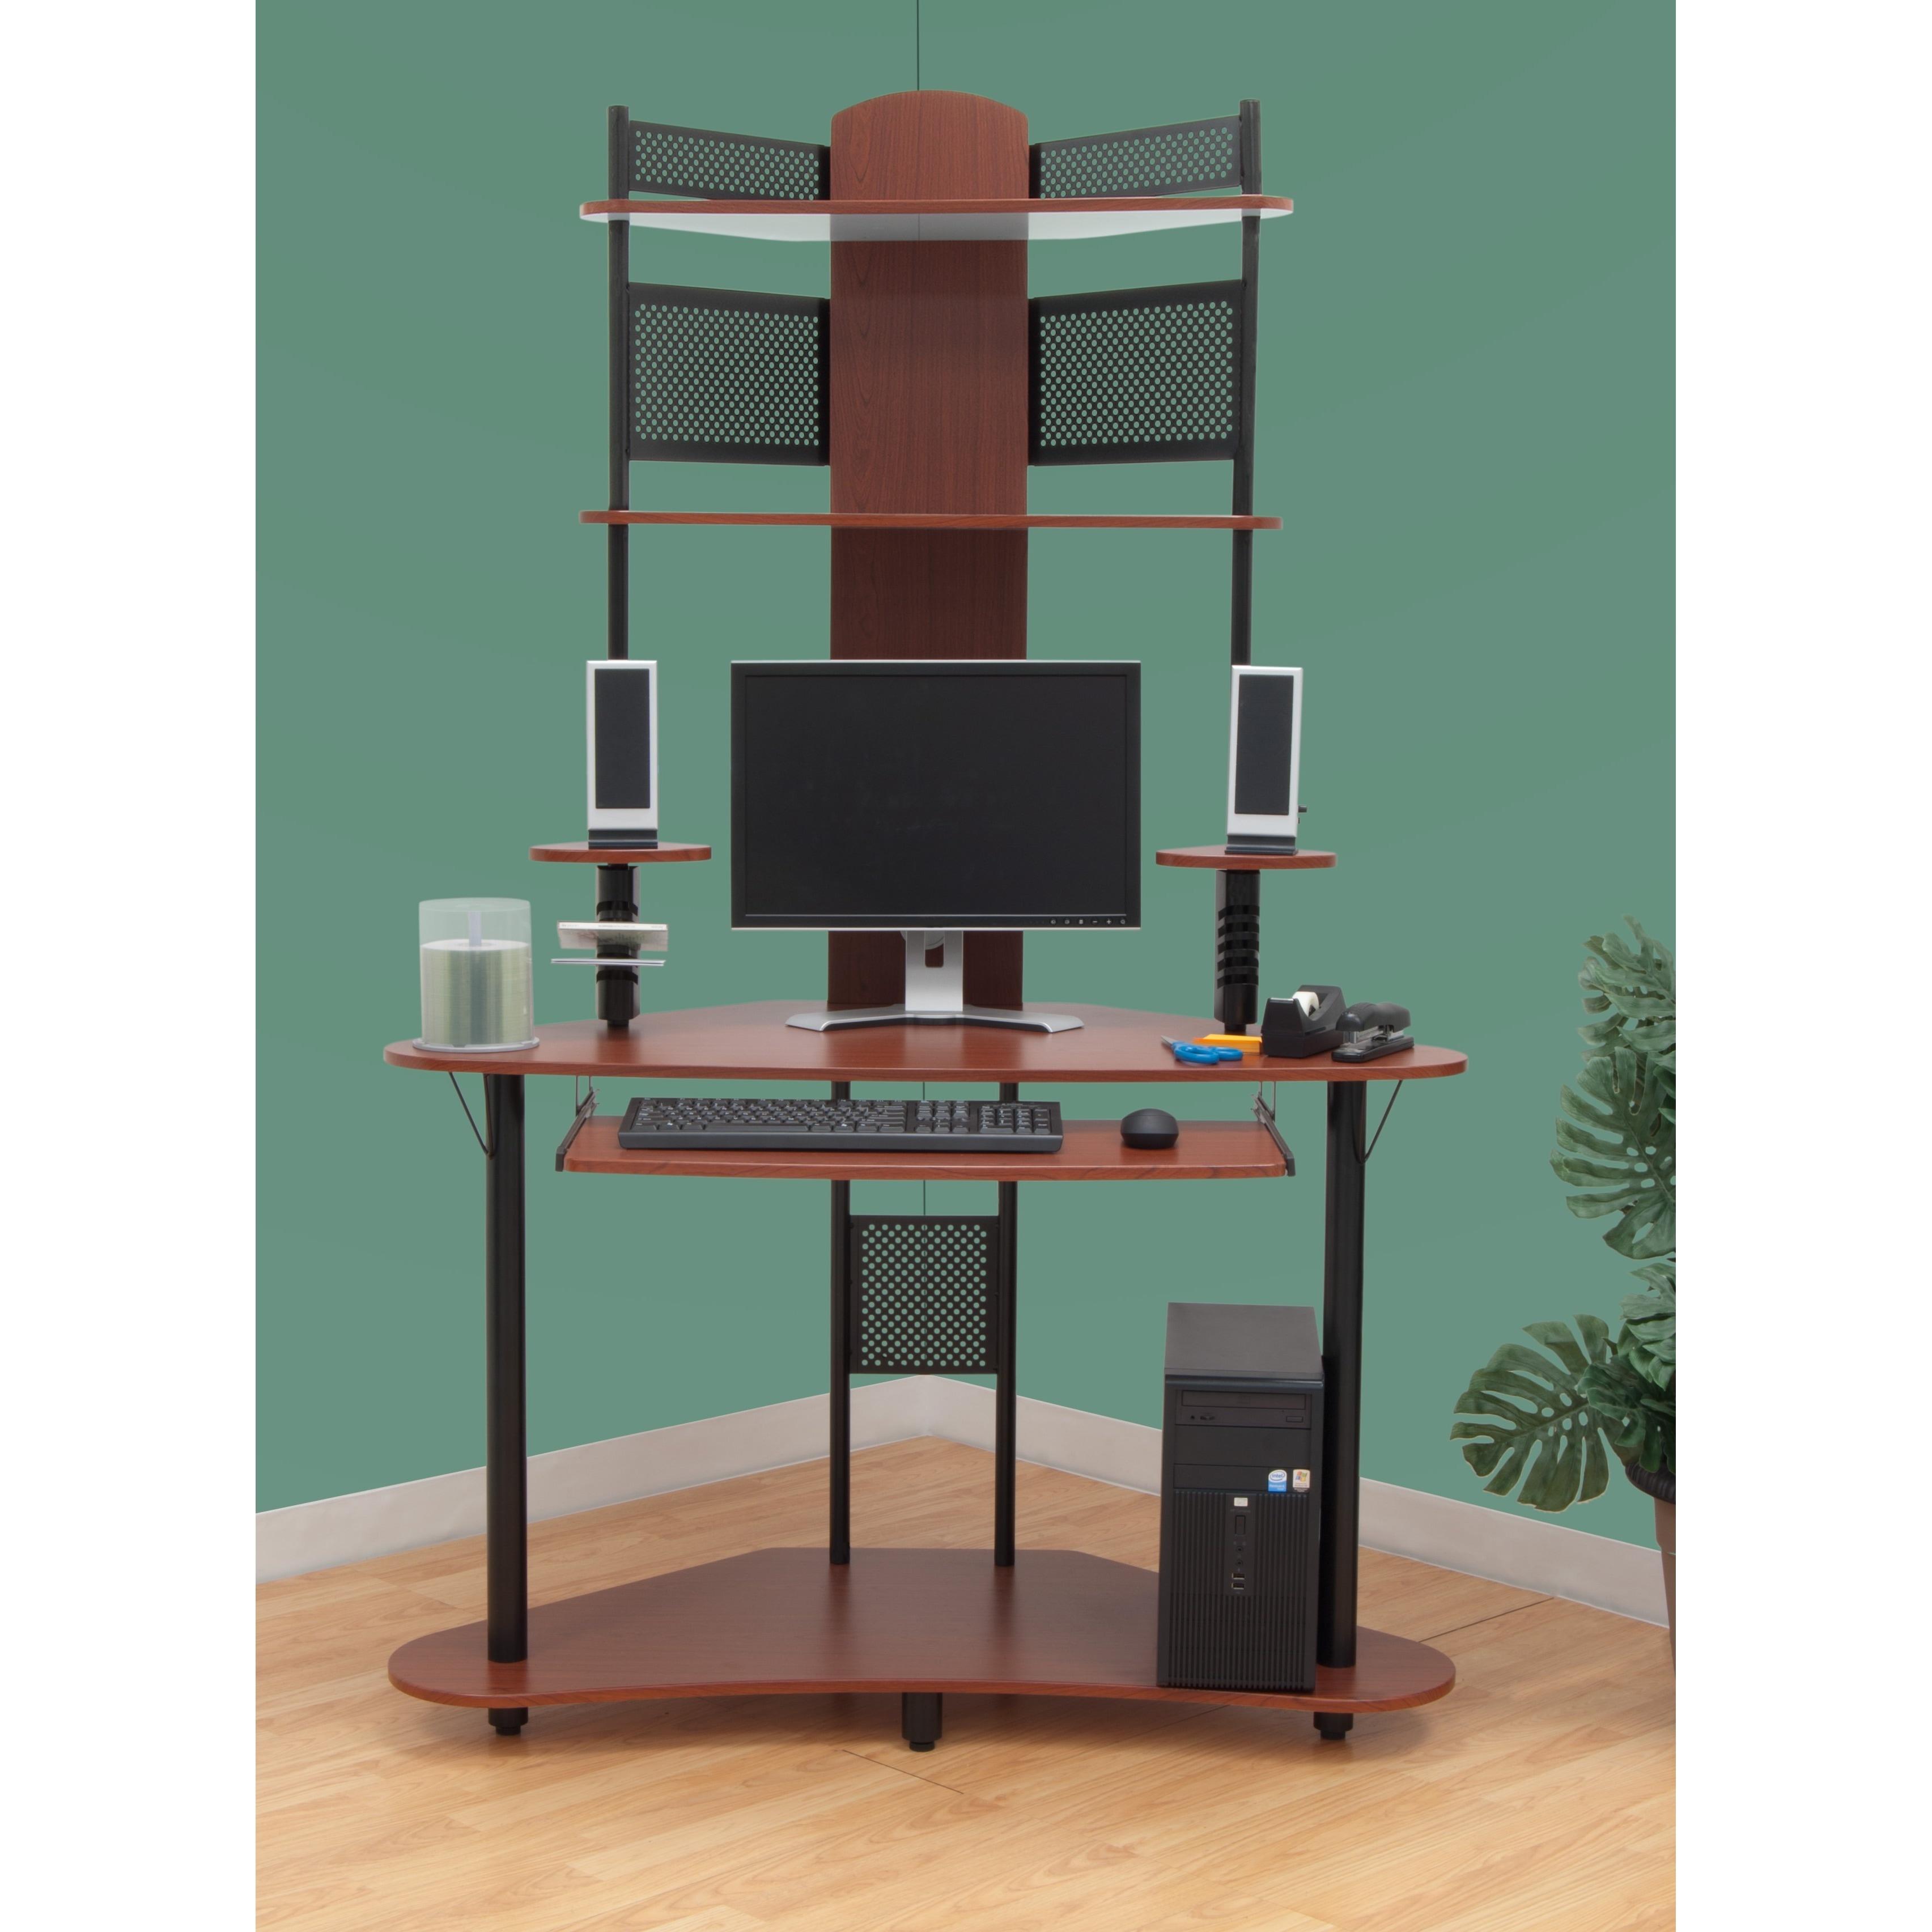 Calico Designs Arch Corner Computer Desk with Hutch / Tower